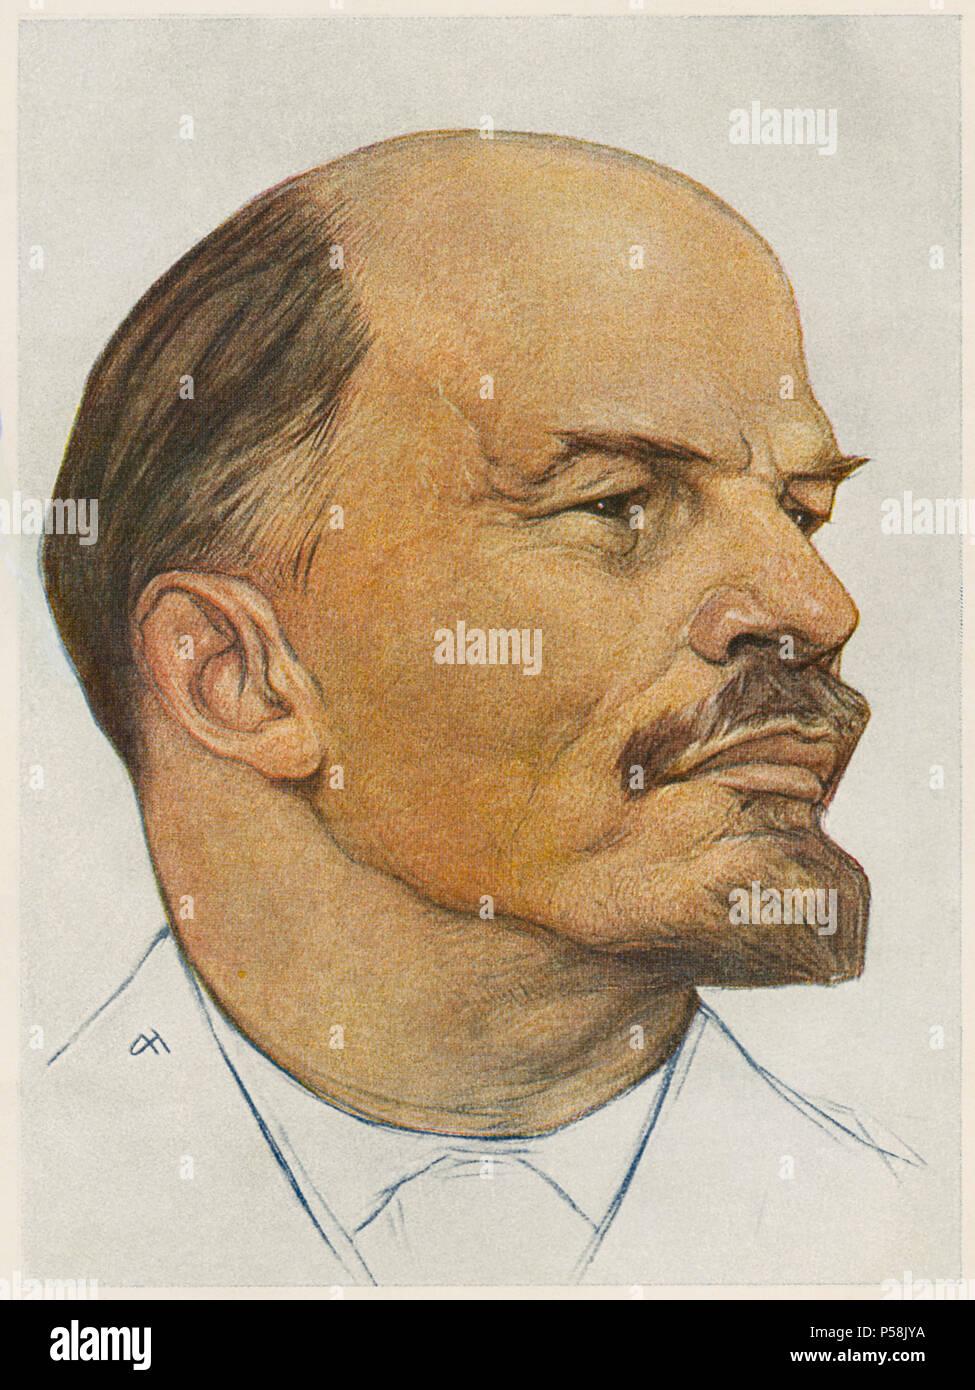 Vladimir Ilyich Lenin (1870-1924), Russian Revolutionary and Premier of the Soviet Union 1922-24, Portrait by Nickolay Andreyev, 1920 - Stock Image